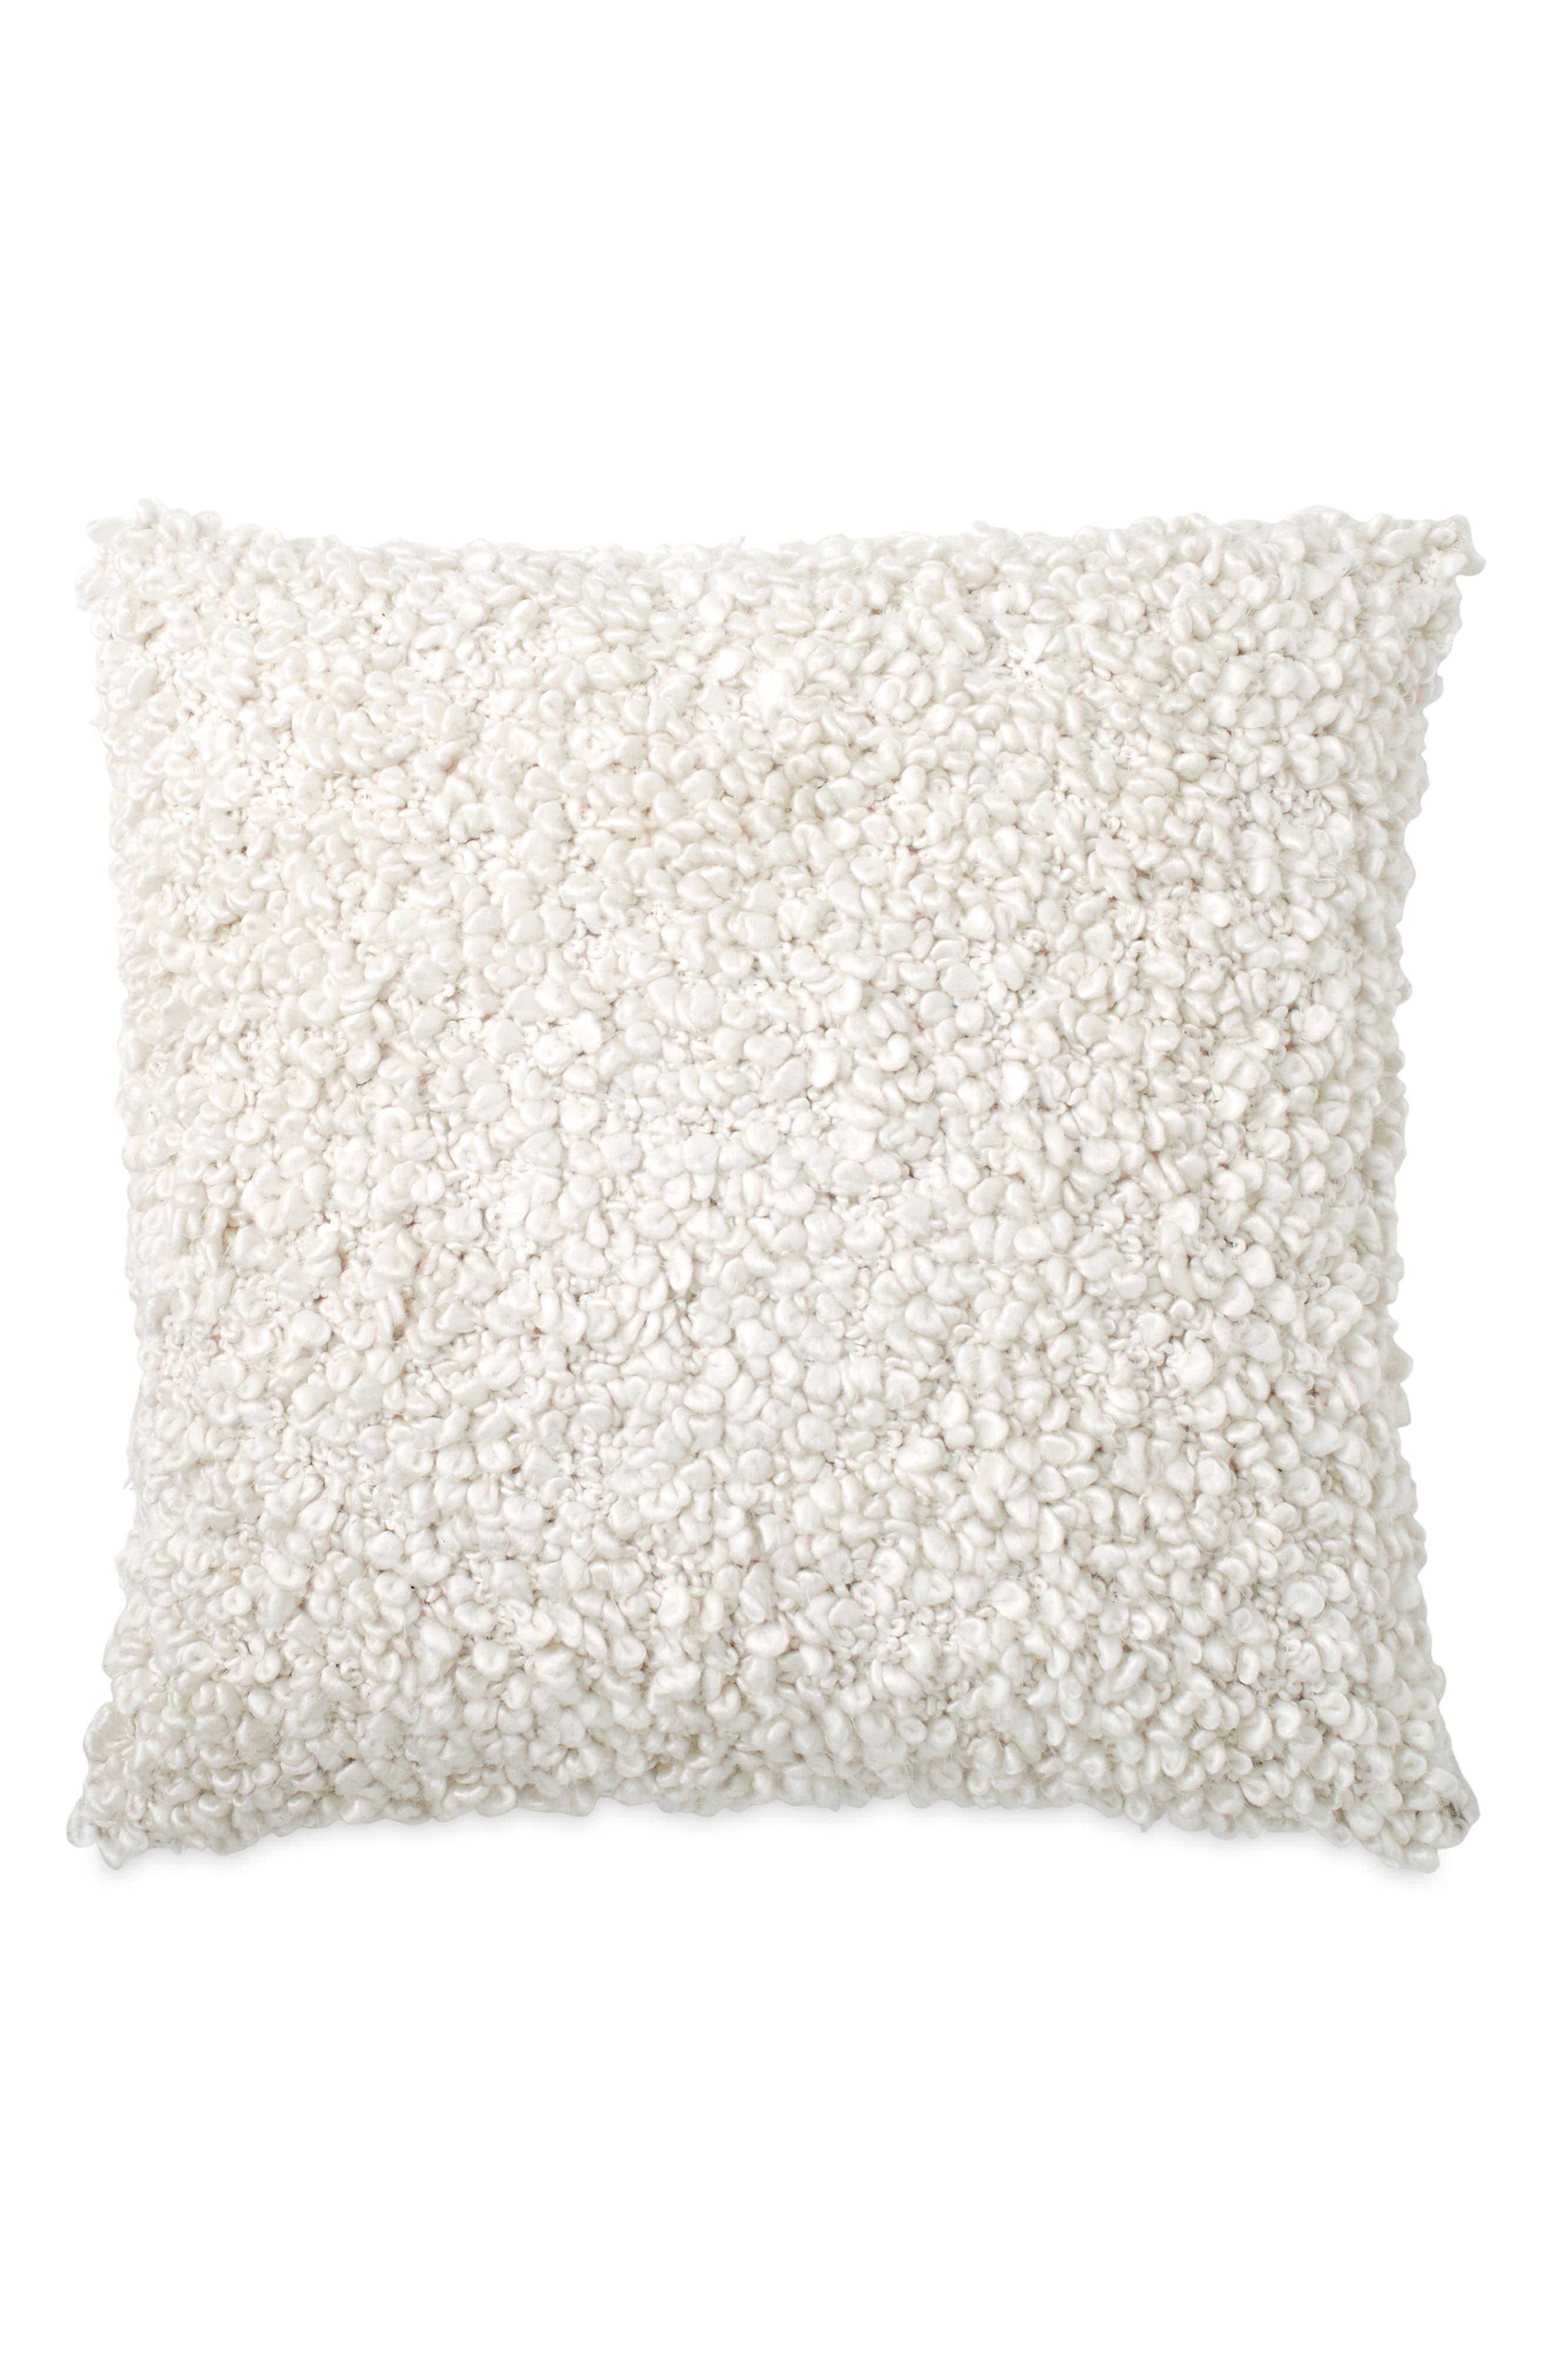 DKNY, Pure Looped Decorative Pillow, Main thumbnail 1, color, IVORY